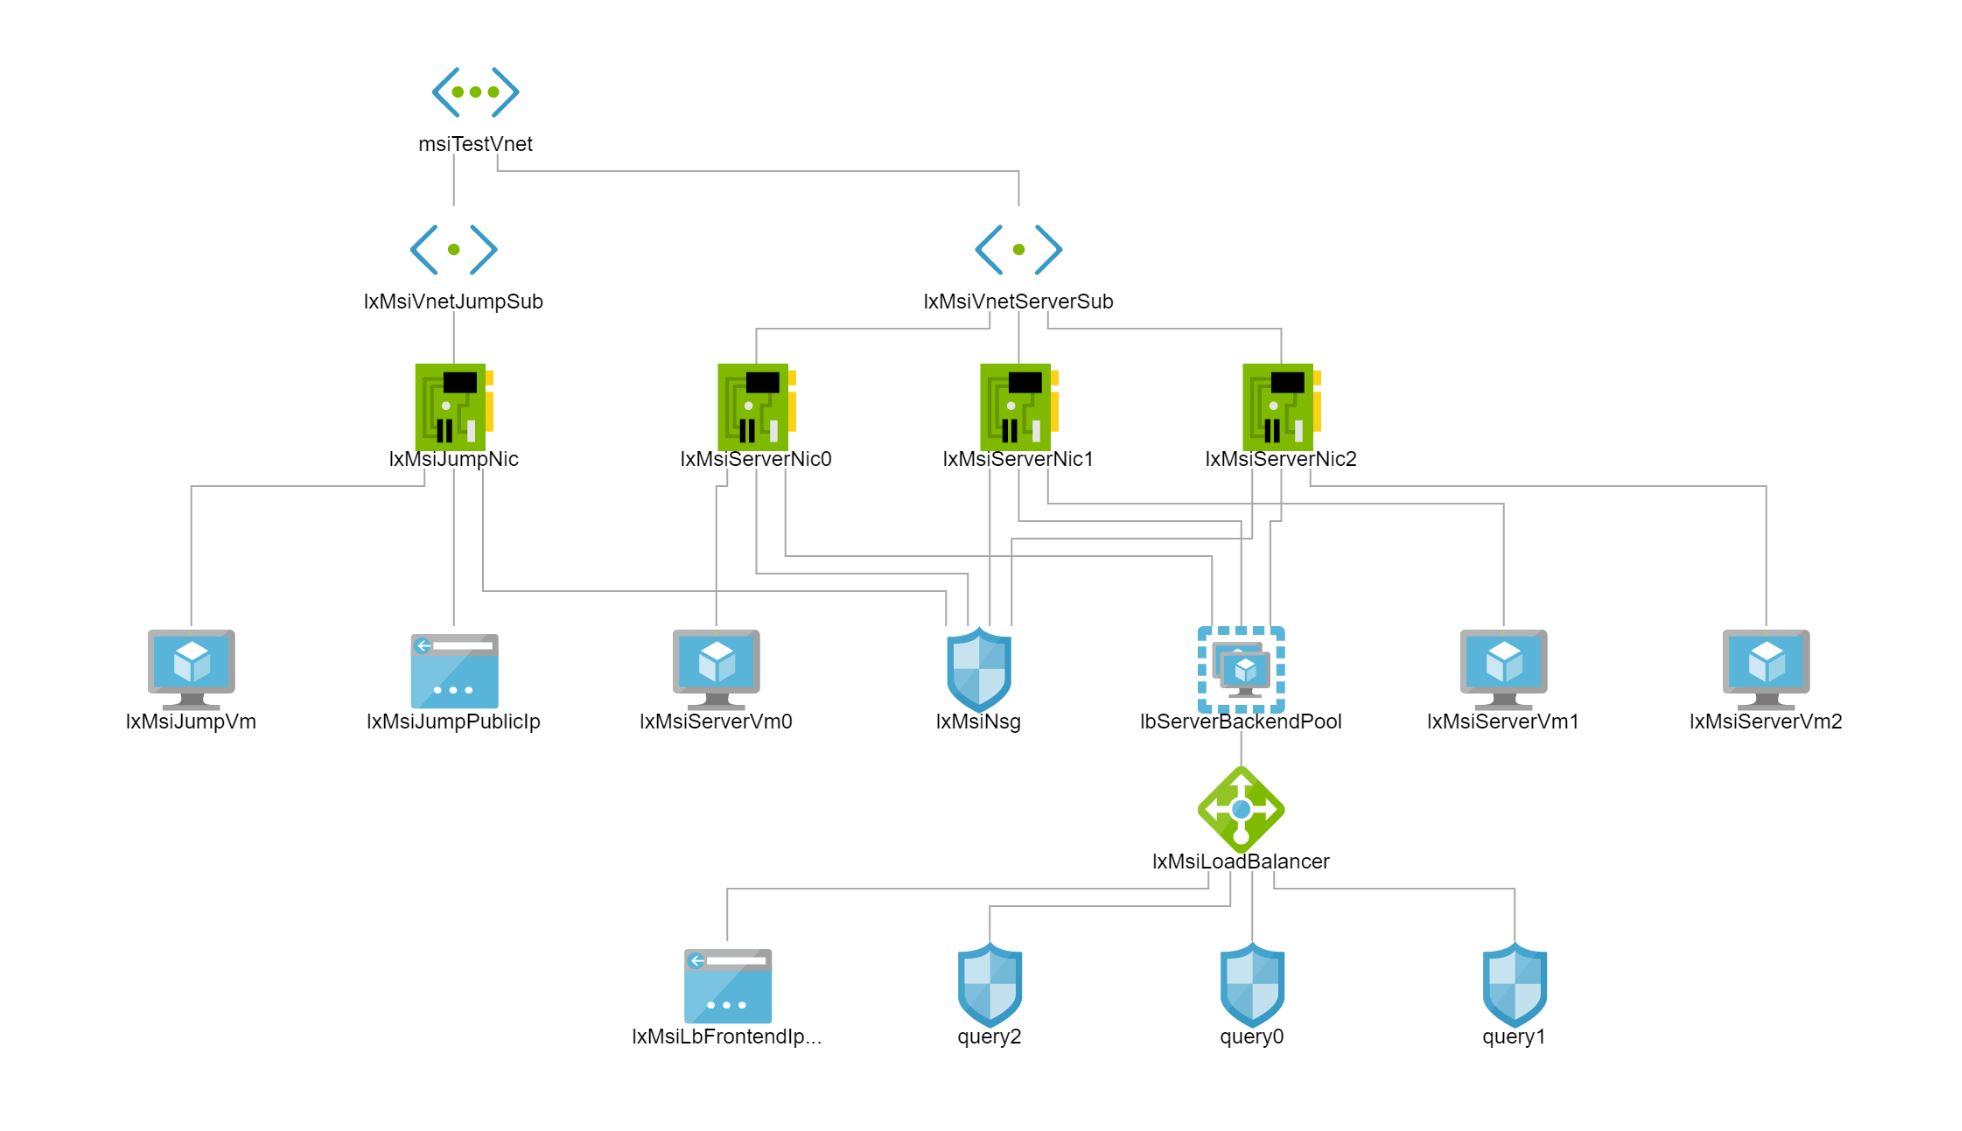 Network Watcher Topology